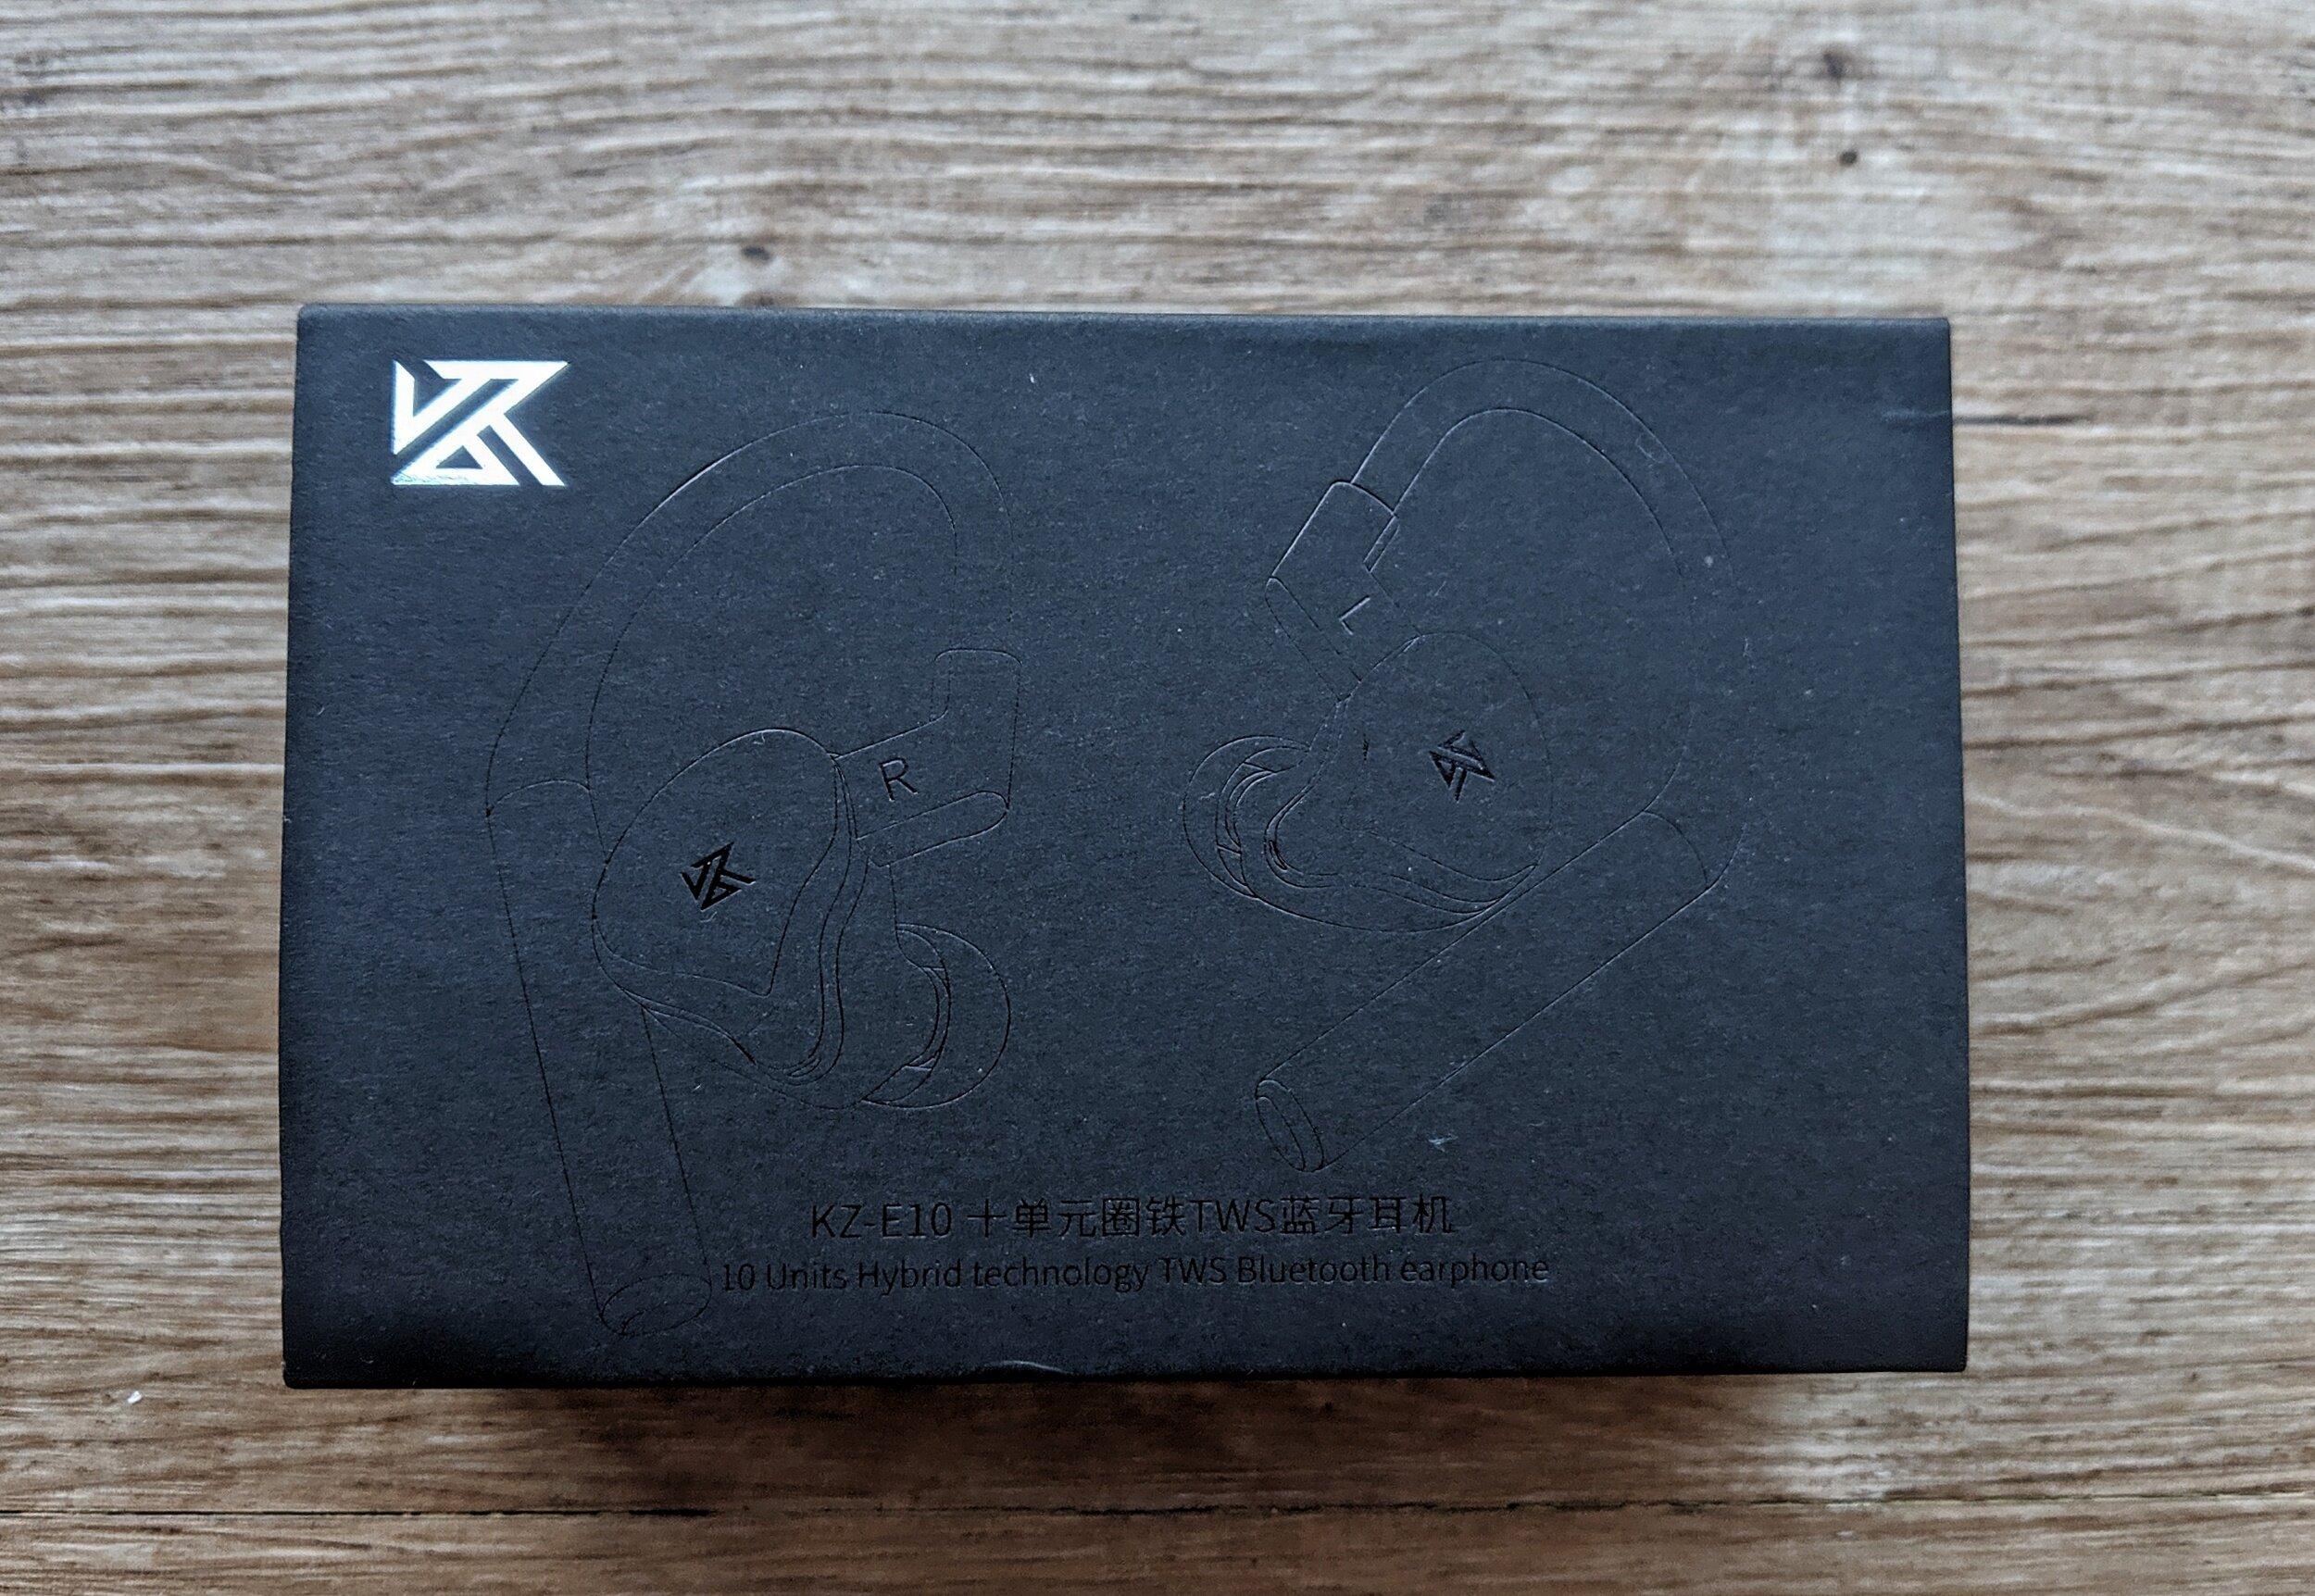 kz tws e10 earphones